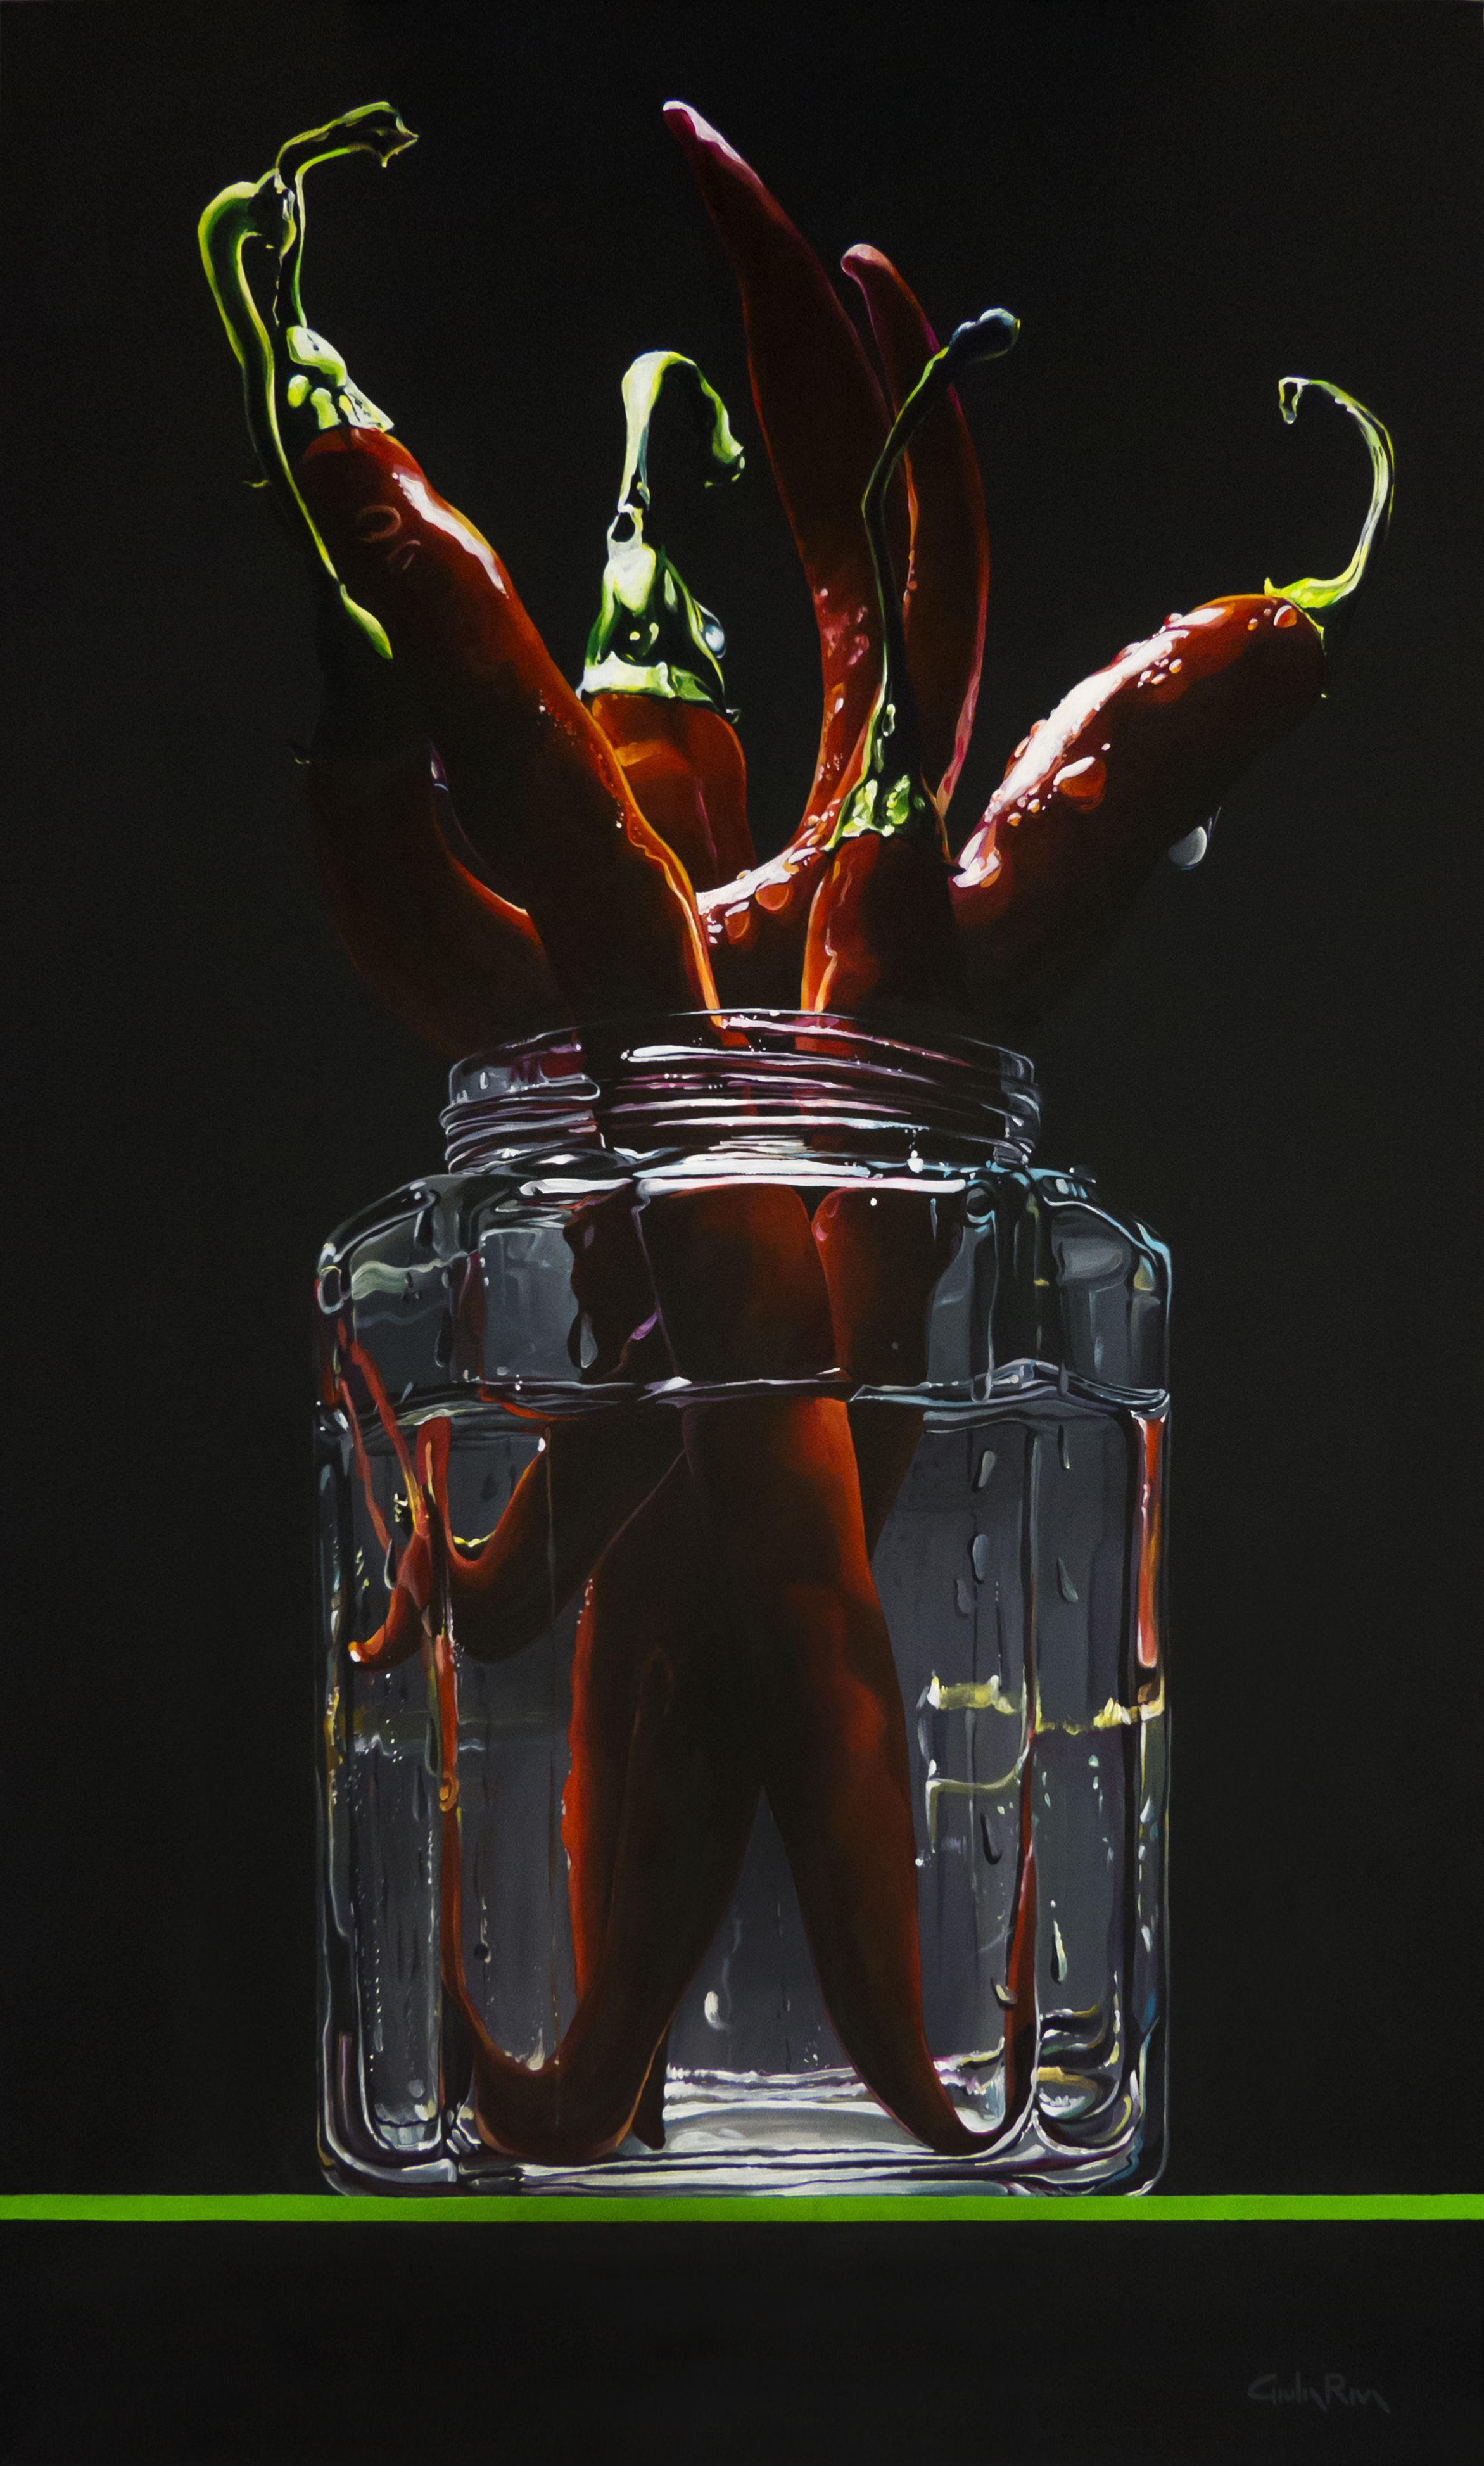 """Il caldo e il freddo"" - ""Hot and cold"" acrilico su tela 60x100 cm - acrilic on canvas 23,4X39"" © Giulia Riva Art #stilllife #redpeppers #red #black #redpepper #hot  #glass #shadows #light #summer #water #paint #realism  #giuliariva #giuliarivaart #acrilicpaint © Giulia Riva Art  Follow me on Instagram: http://instagram.com/giuliariva_art"